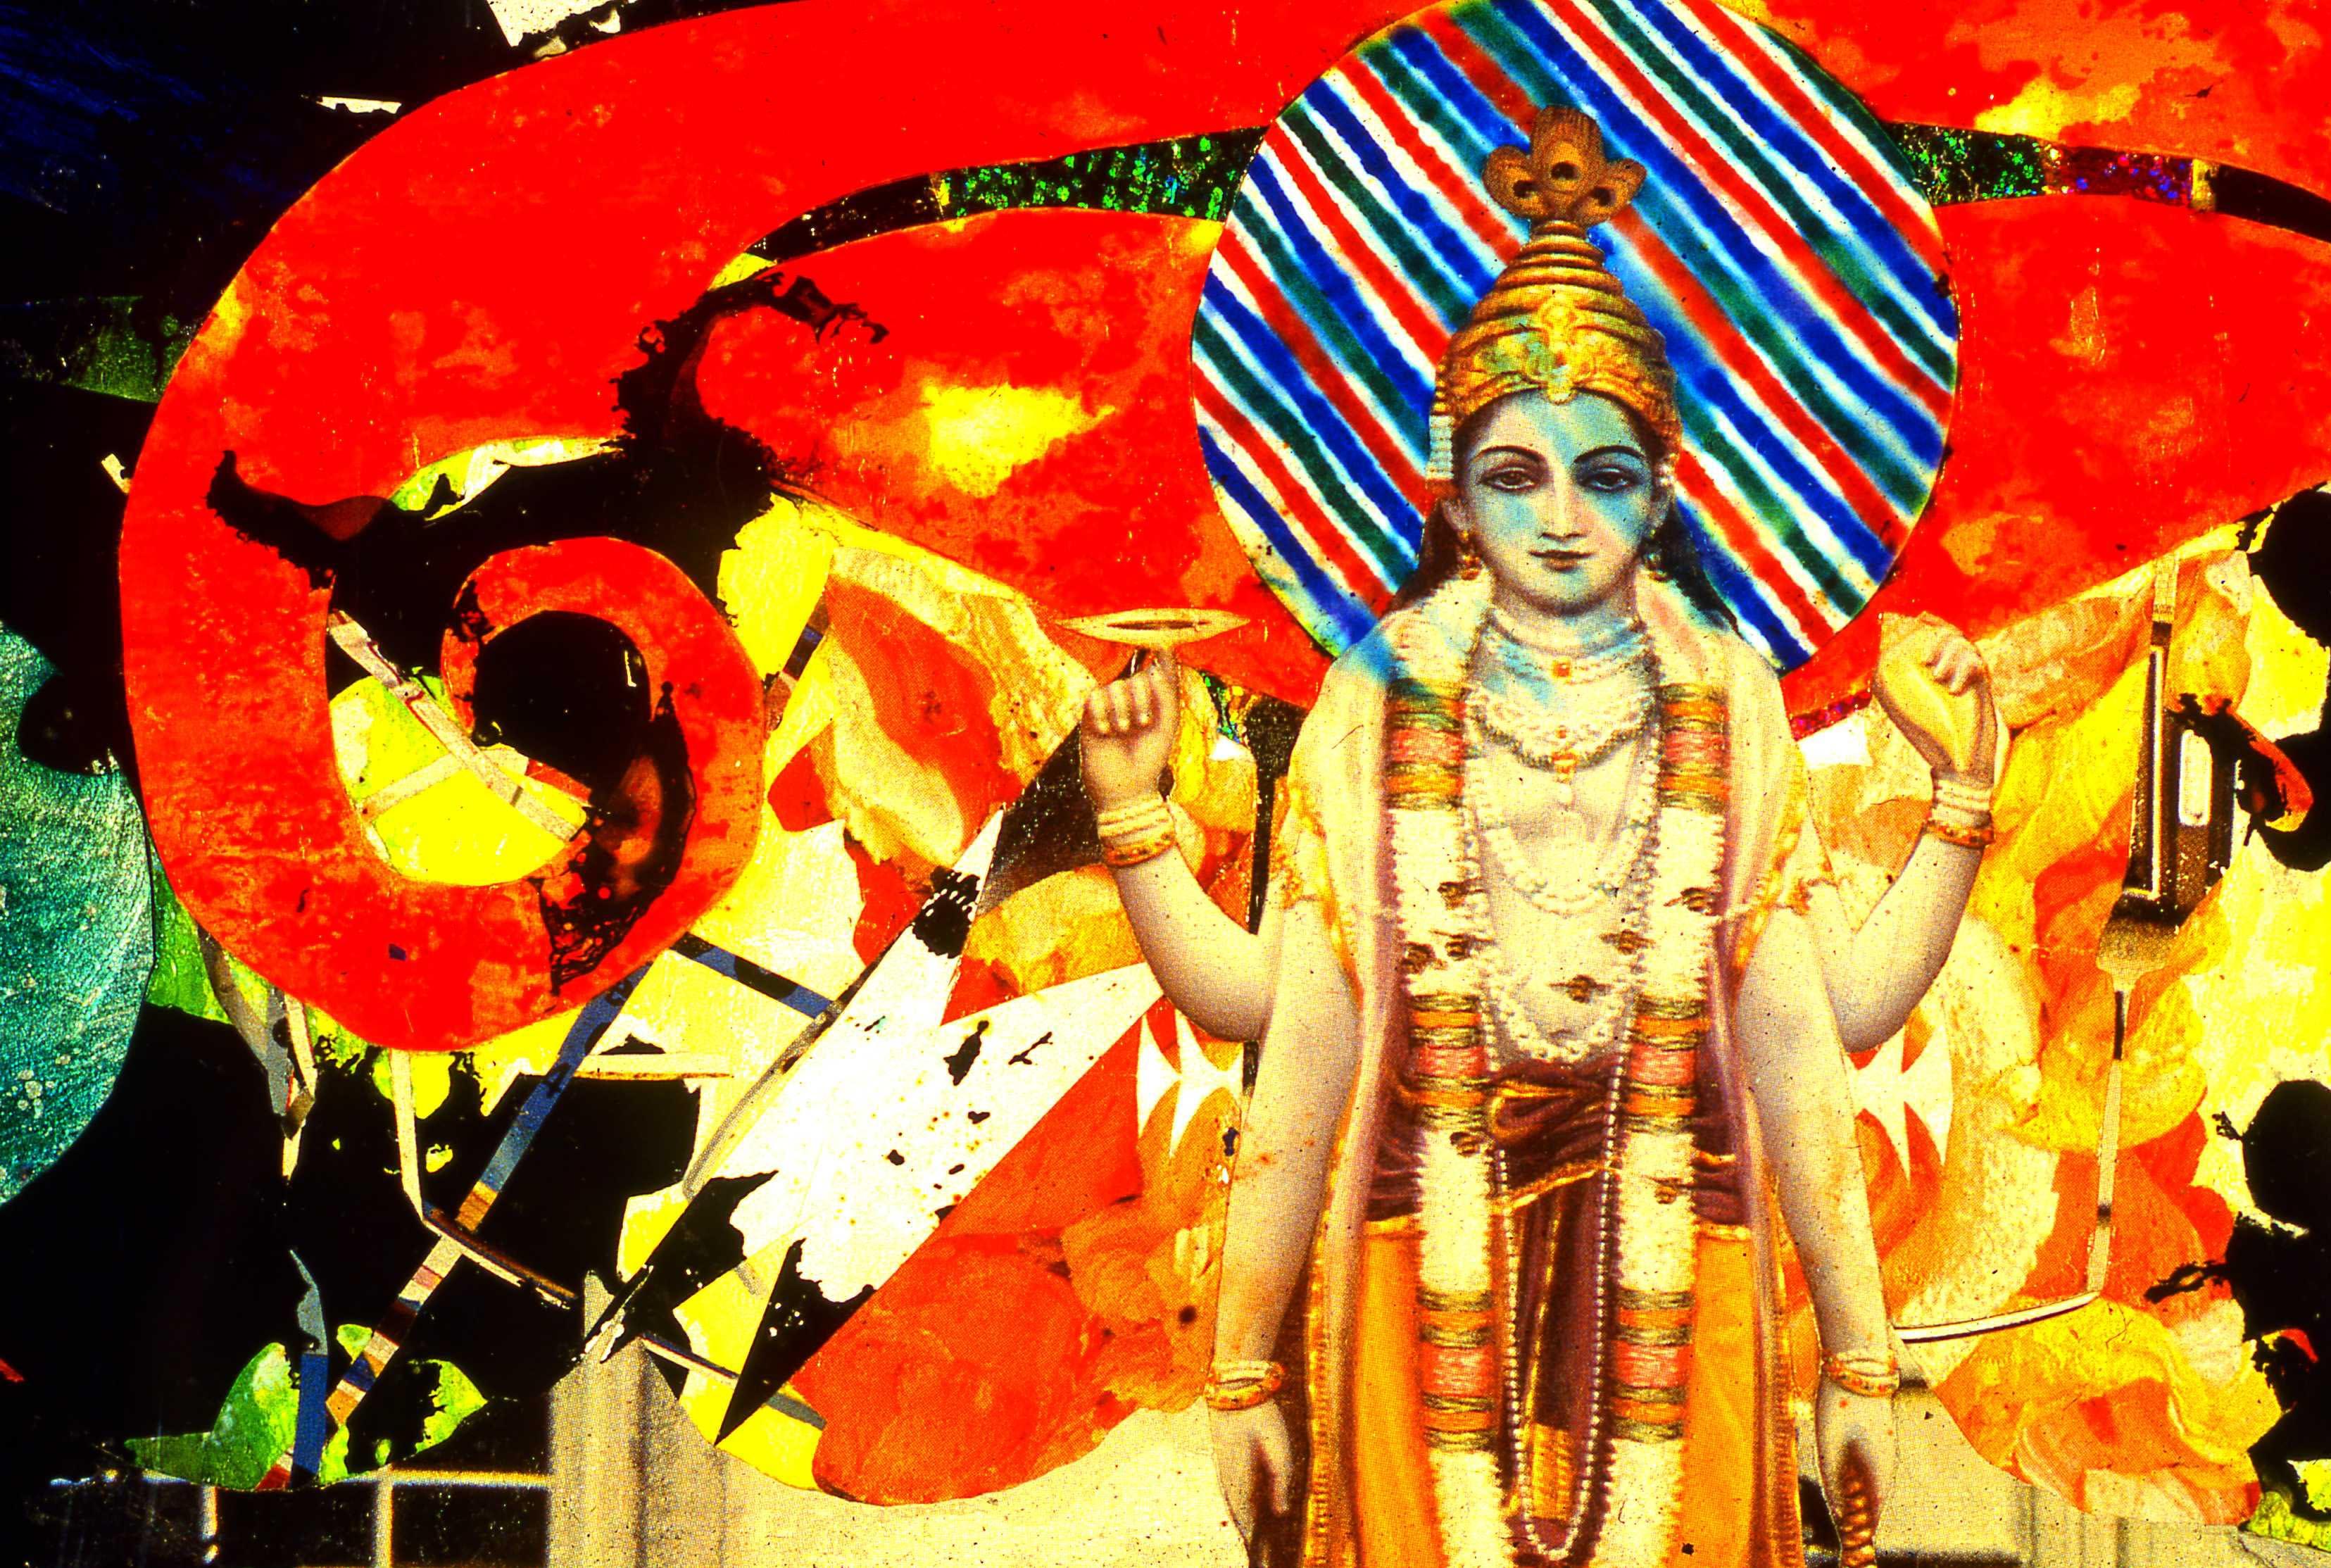 """Vishnu"" (detail) 2001, Collage-painting on plexiglas, approximately 7x23 inches"